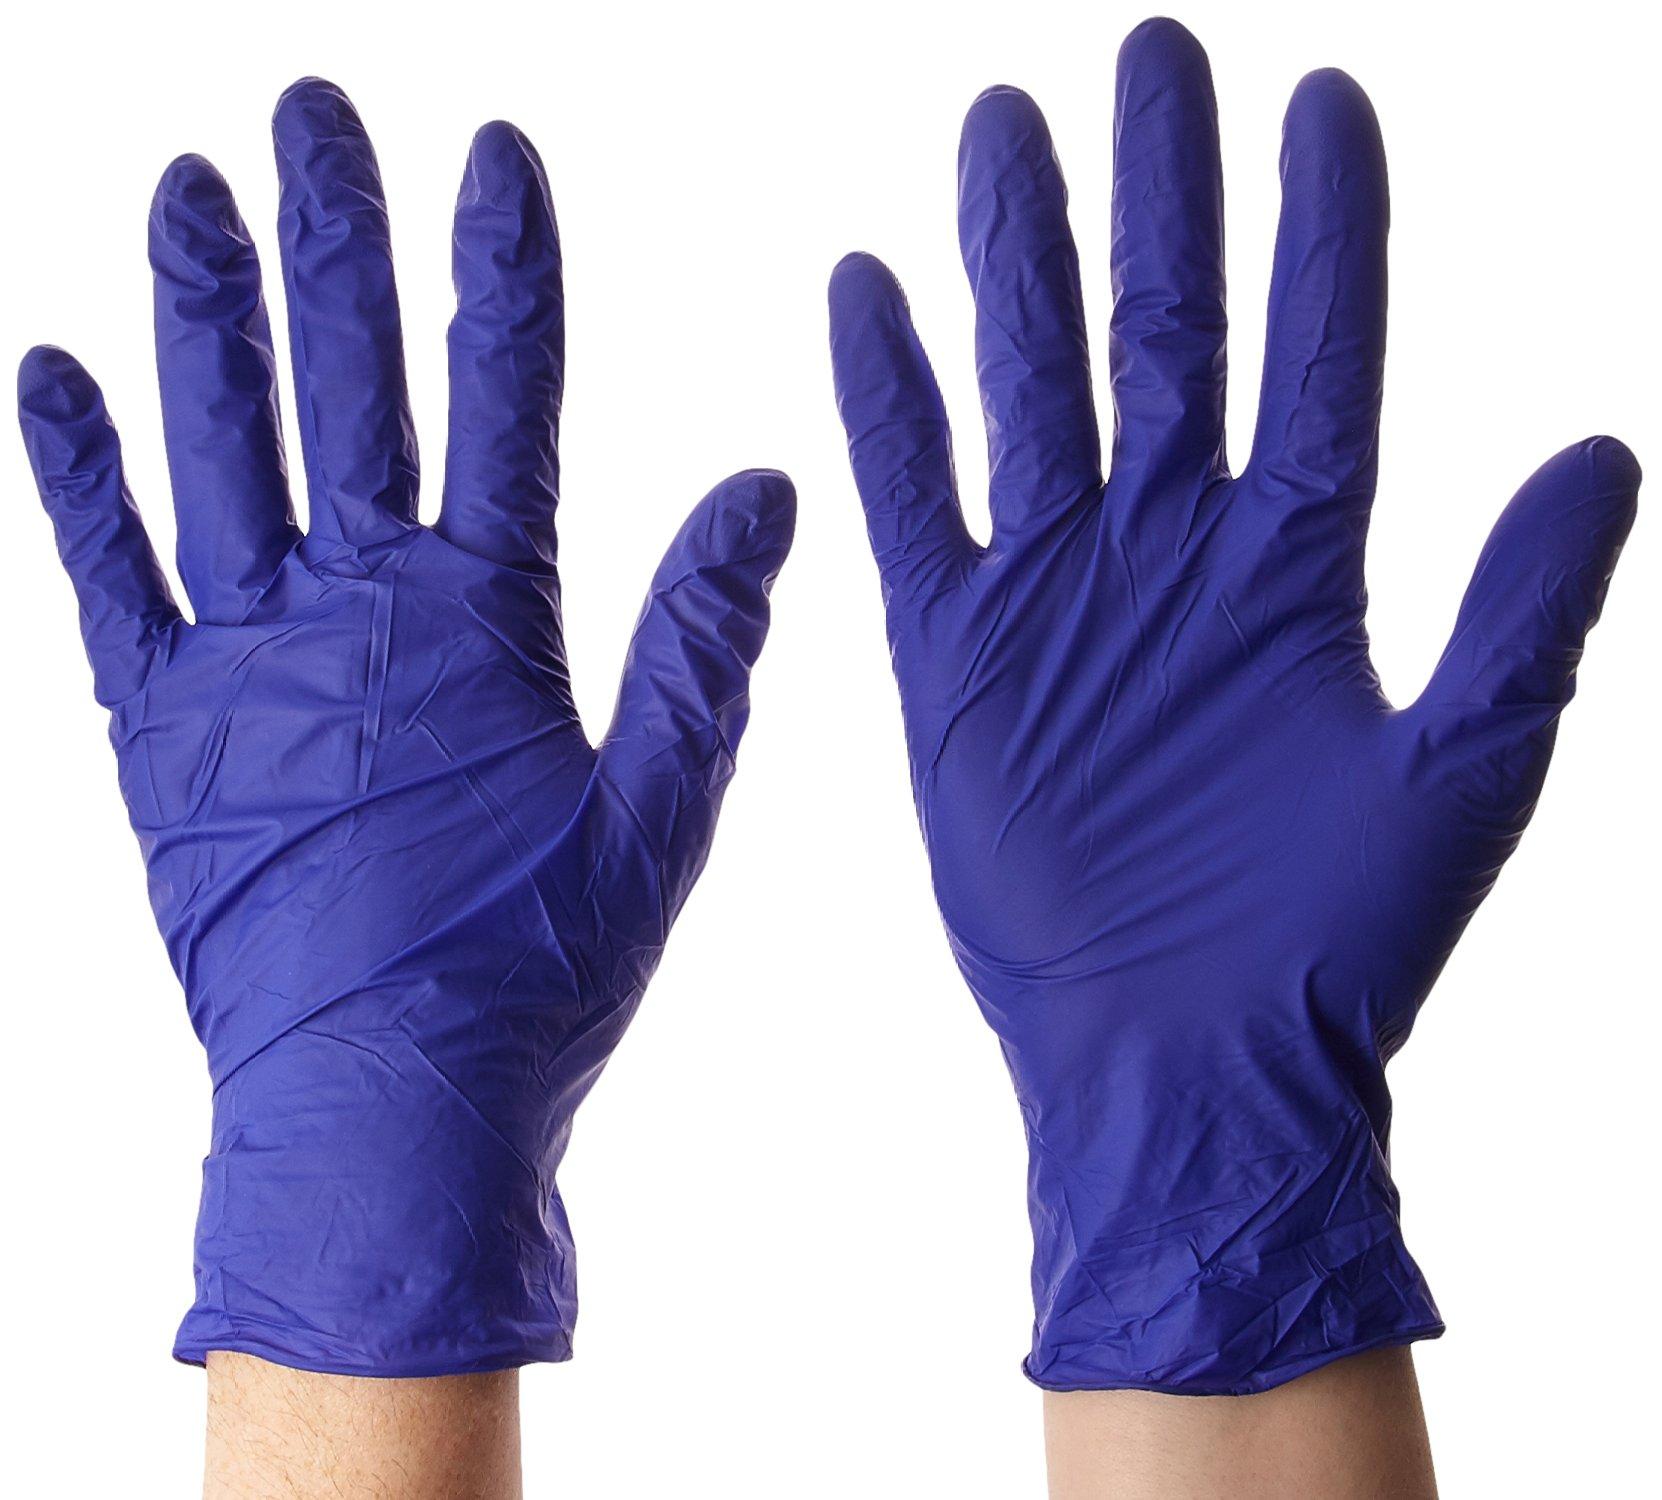 Microflex UF524M Ultraform Powder Free Nitrile Glove Size Medium Box of 300